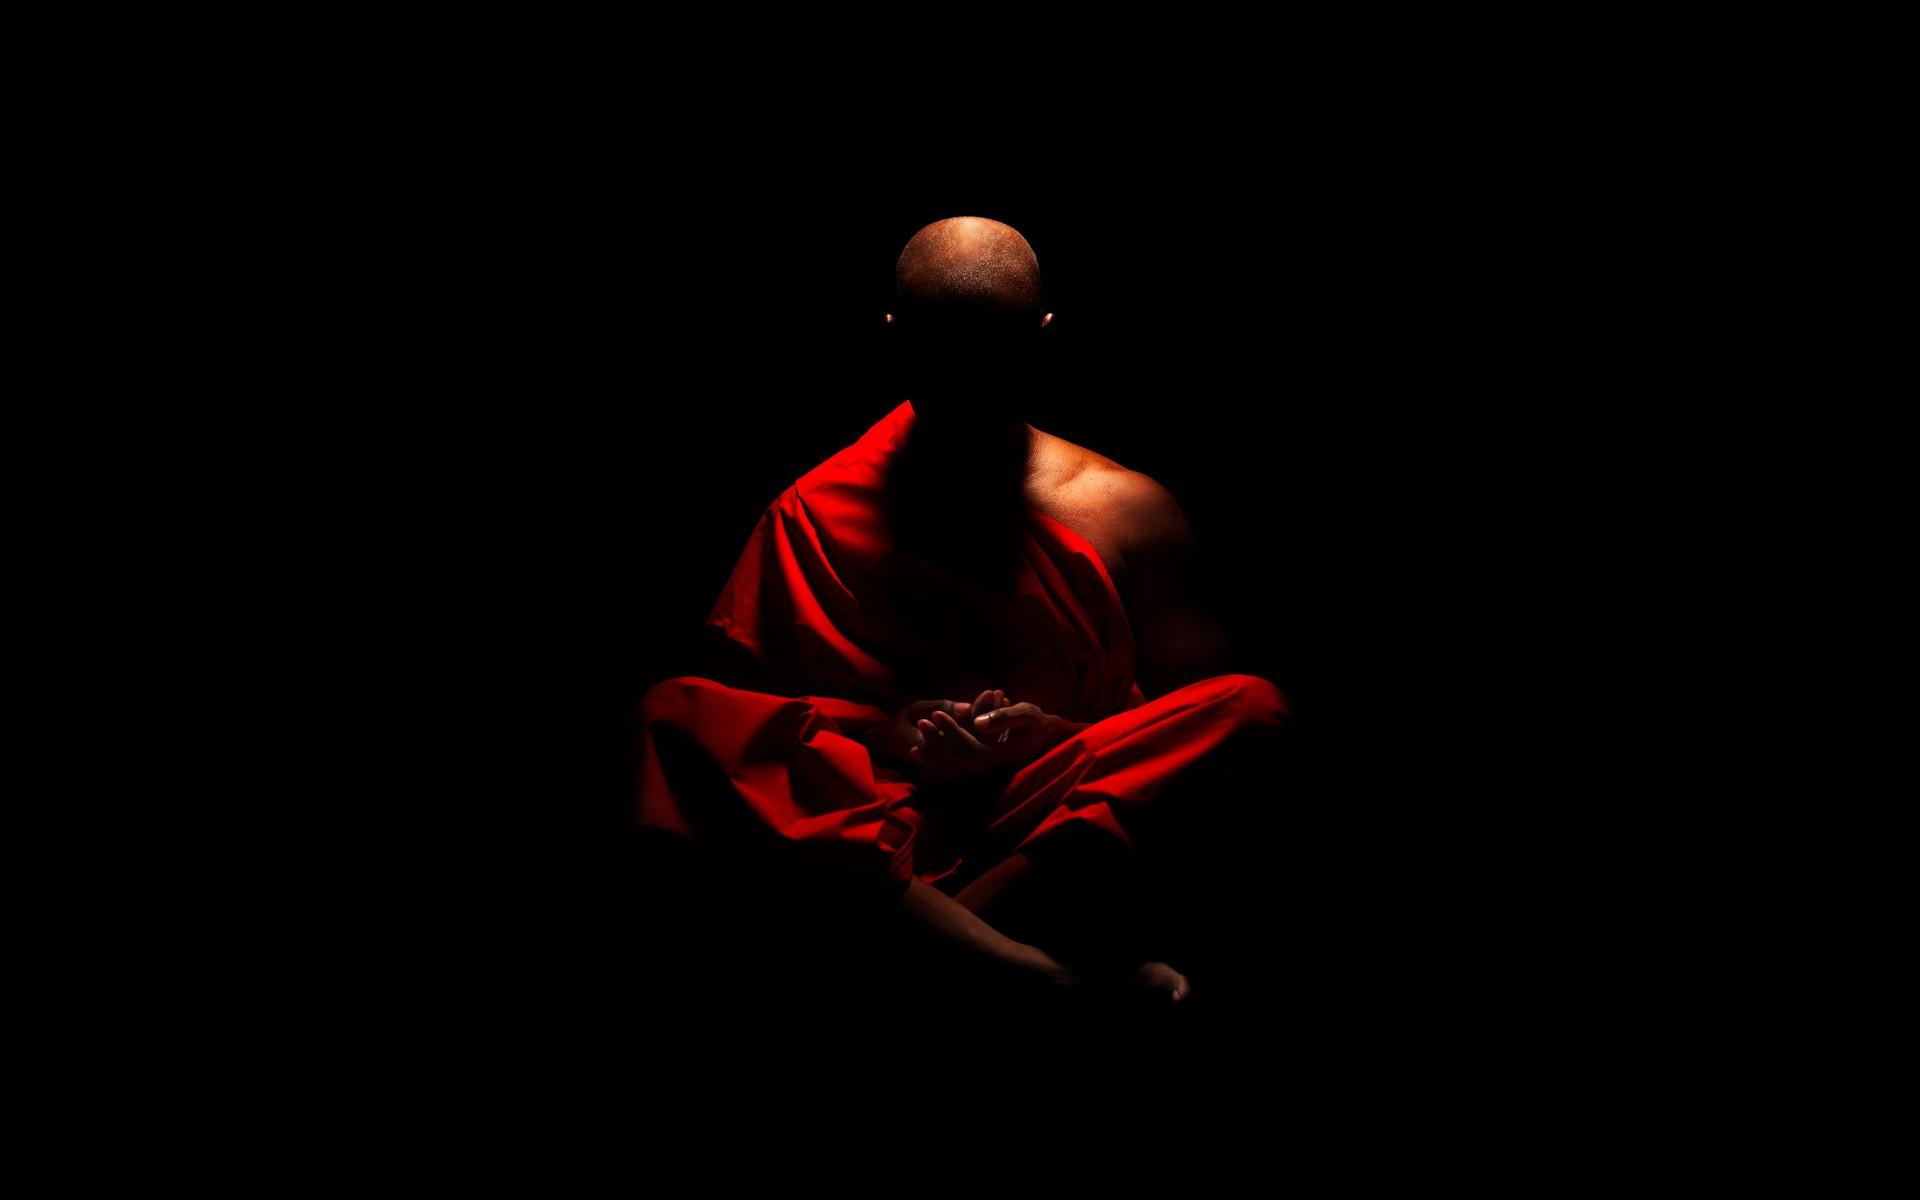 File:Dark-head-tibet-warrior.jpg - Chinese Buddhist Encyclopedia